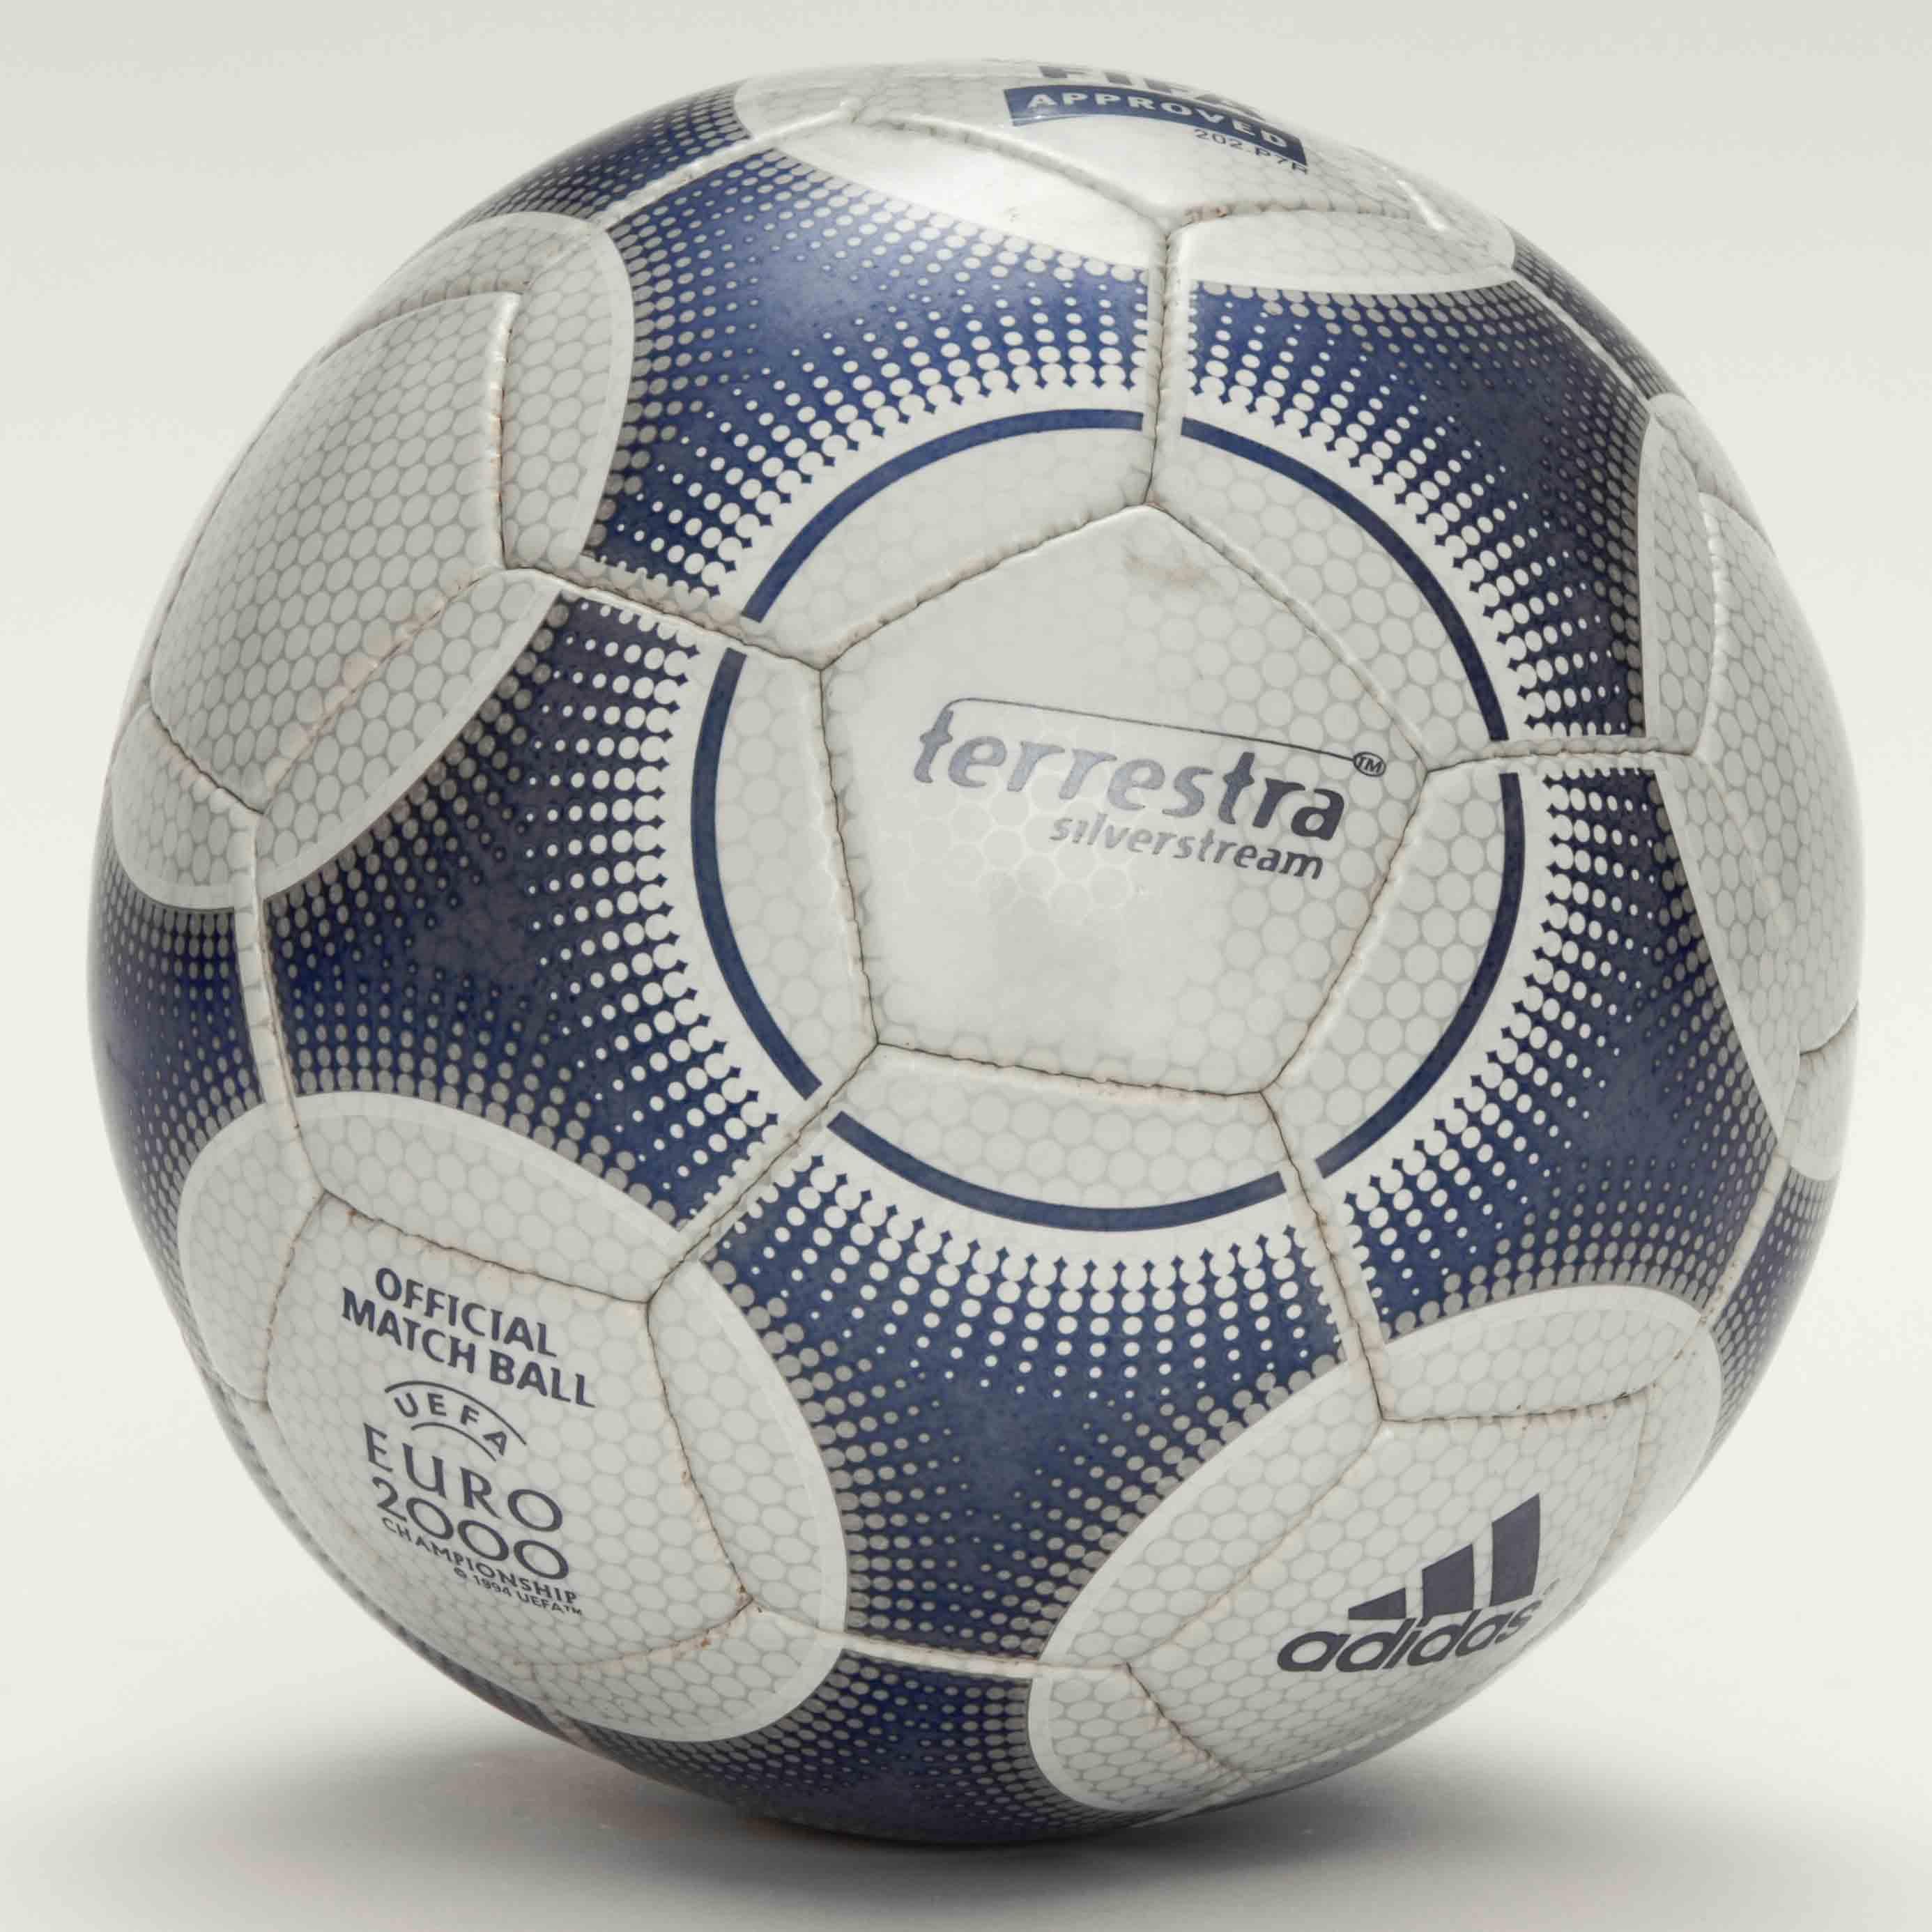 Мячом финал Кубка УЕФА 2000 года был Terrestra Silverstream